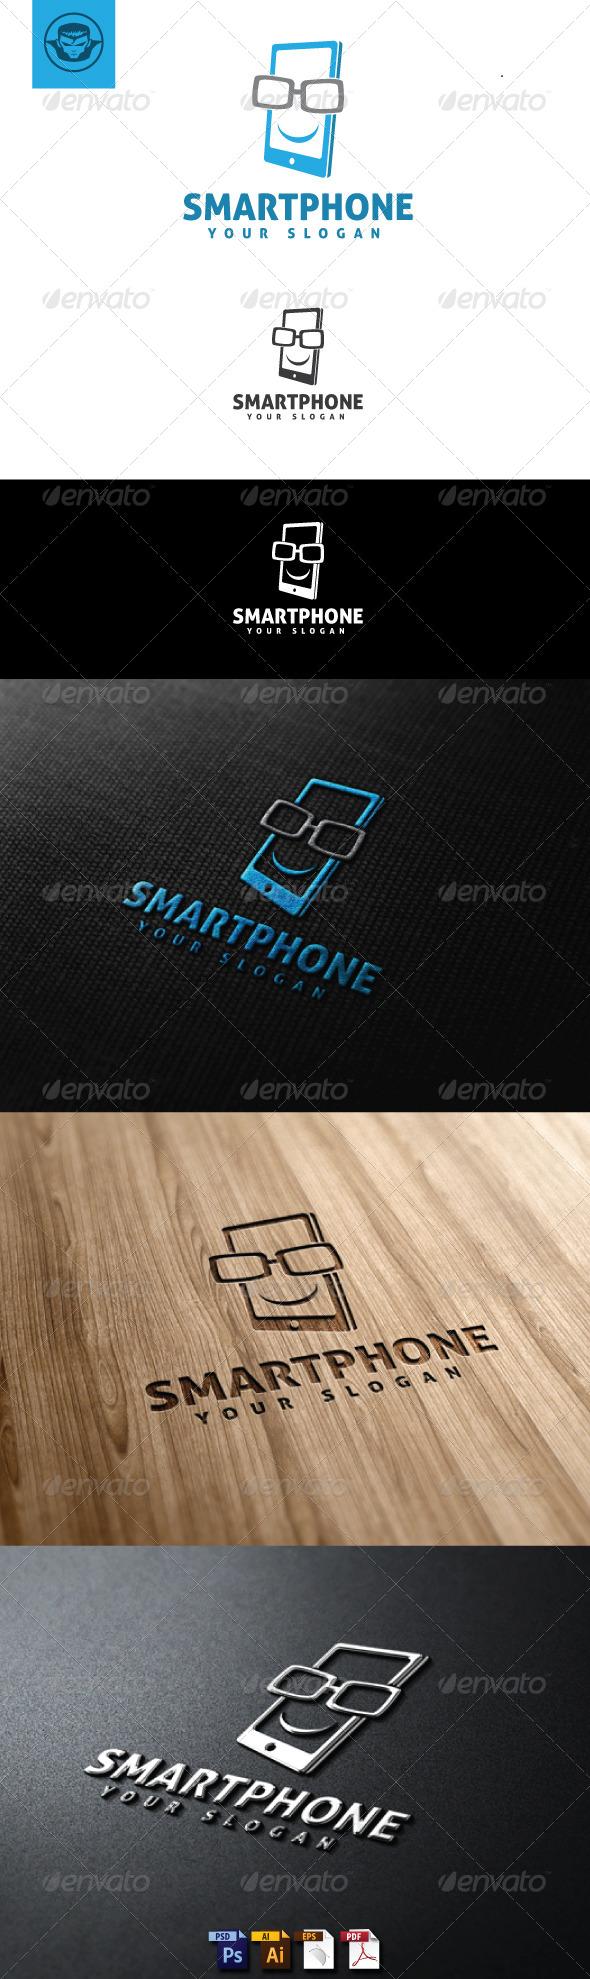 GraphicRiver Smartphone Logo Template 4936919